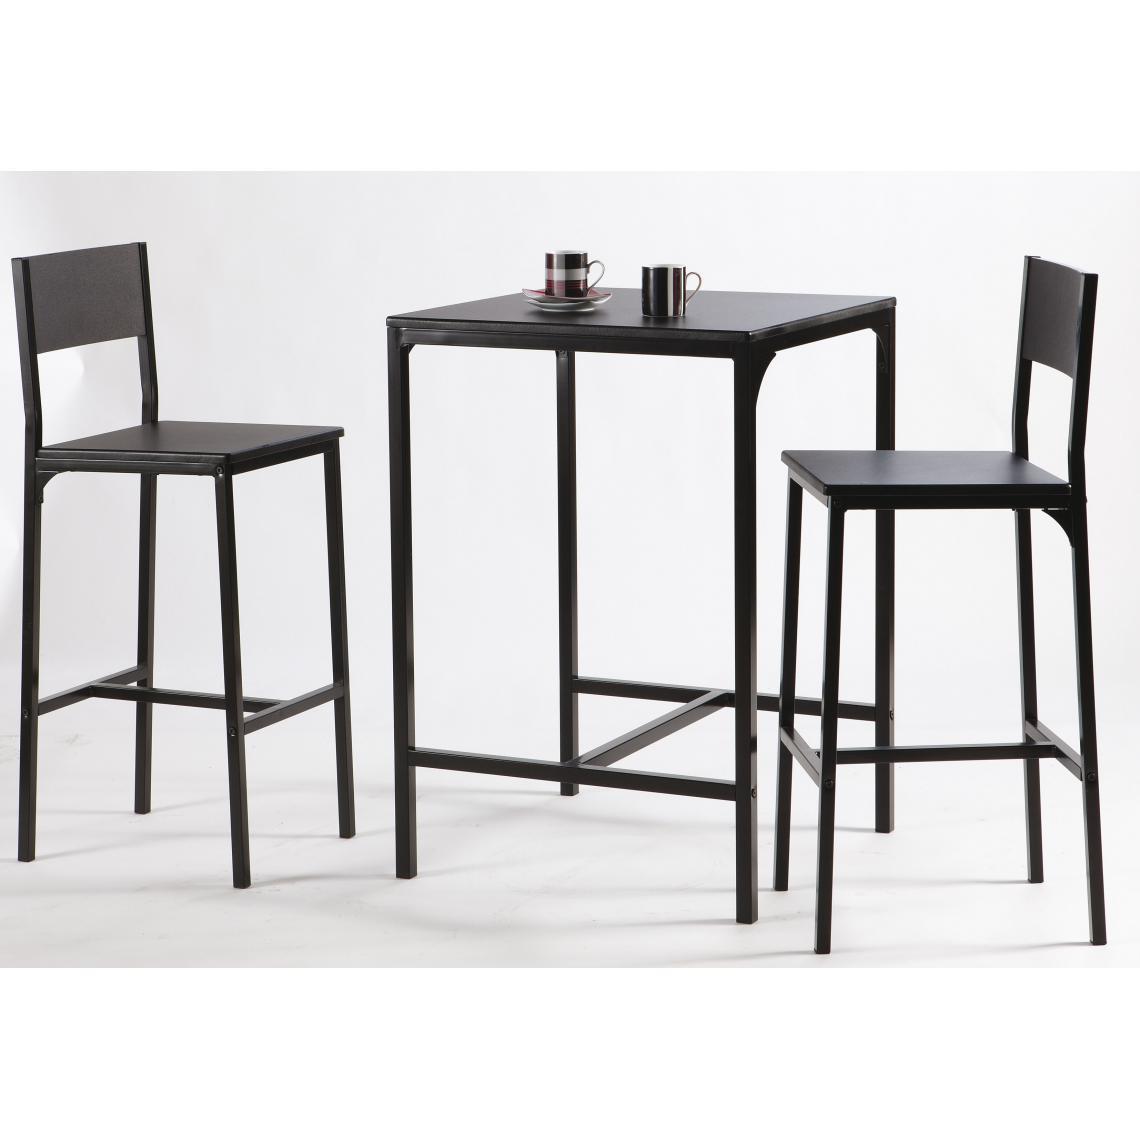 Haute Table Chaises Funky3 Avec 2 Suisses BQxrdCoeW